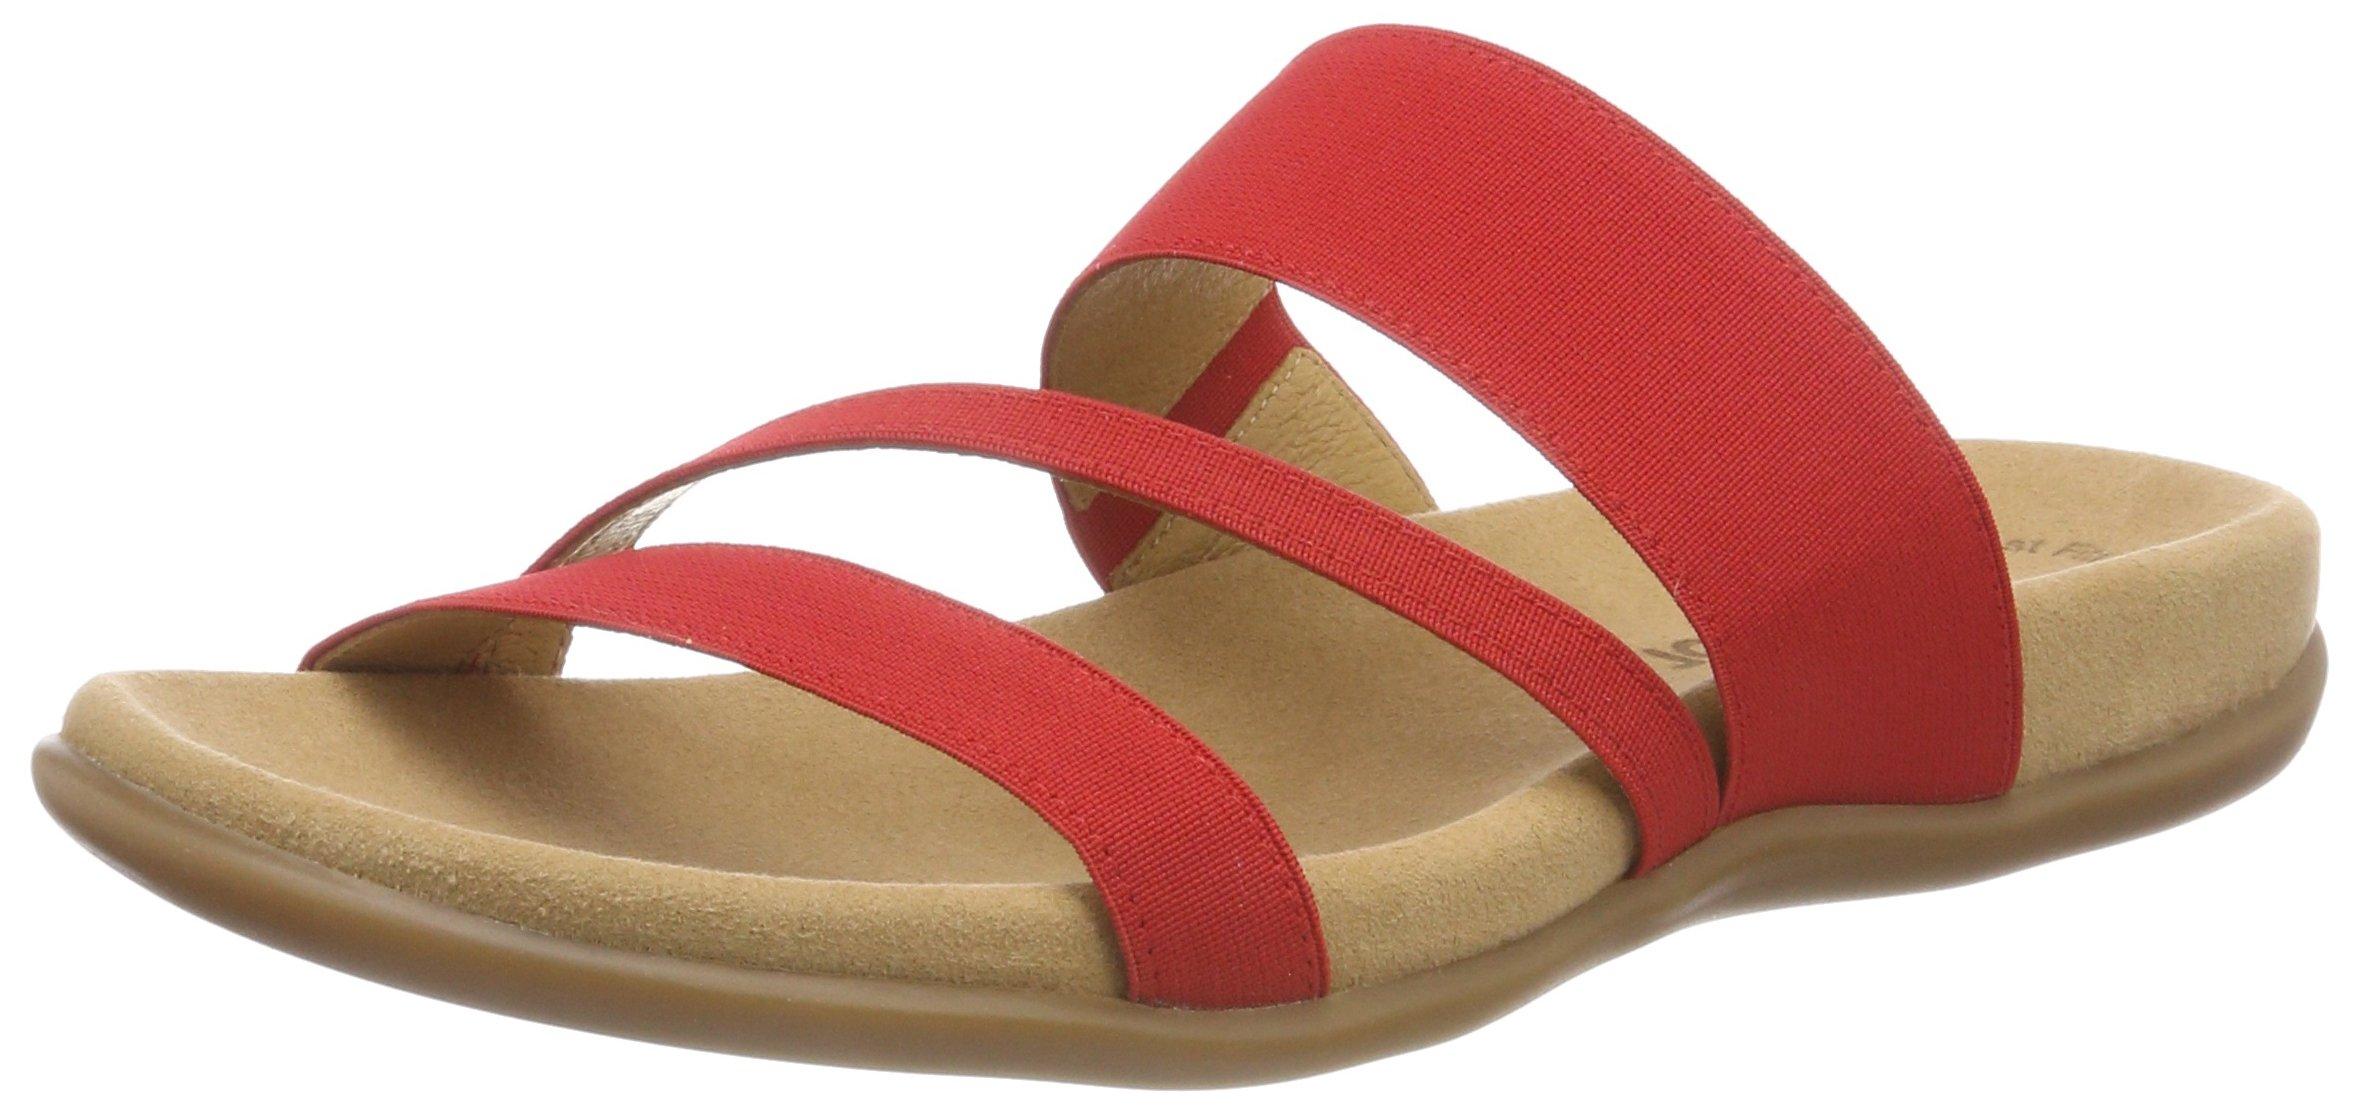 Gabor Eu JollysMules Shoes FemmeRougeflame41 JollysMules Eu Shoes Gabor FemmeRougeflame41 Gabor dhsQrtCx